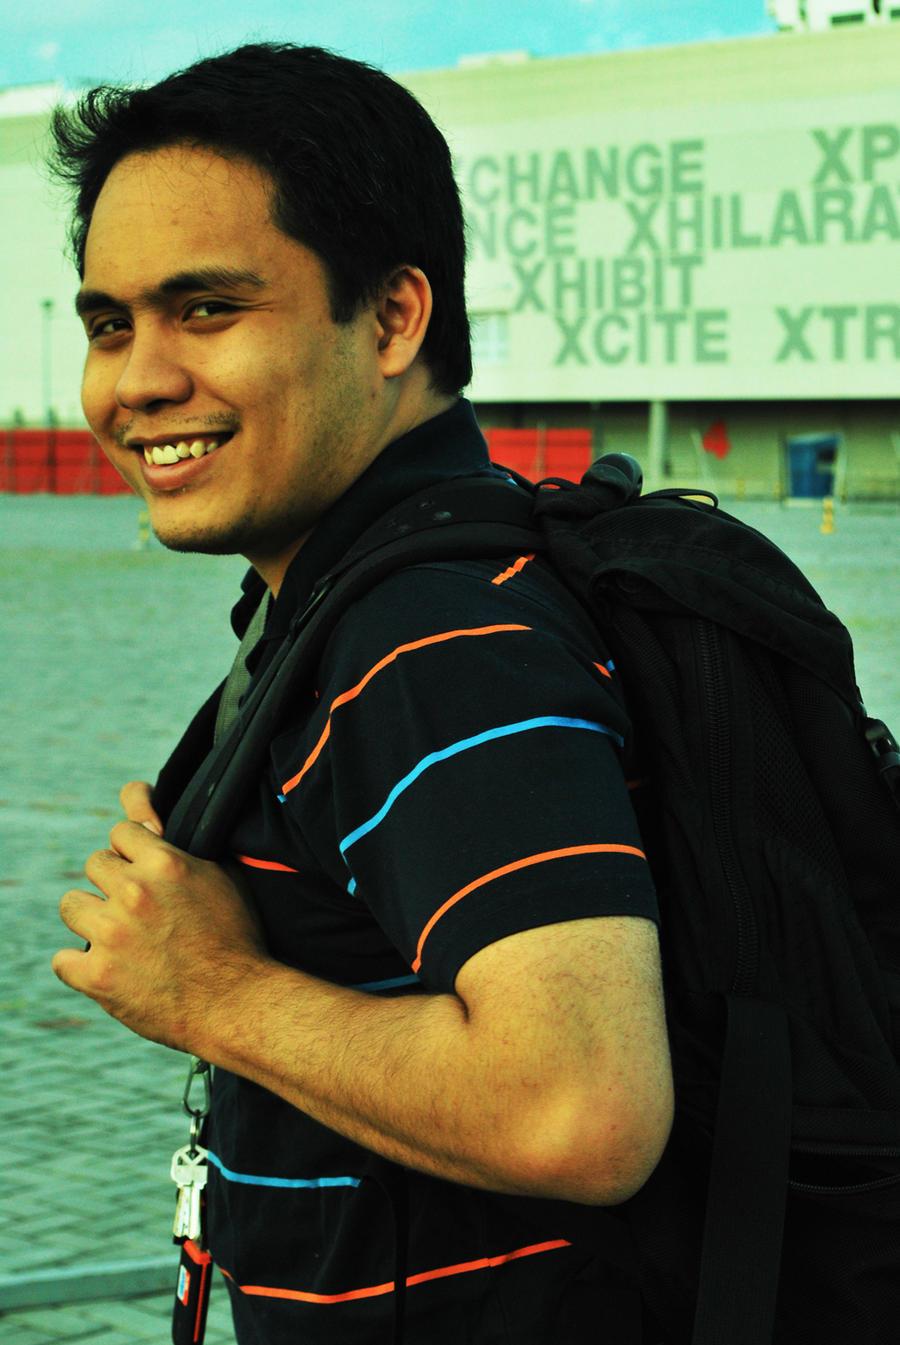 genocide2004's Profile Picture